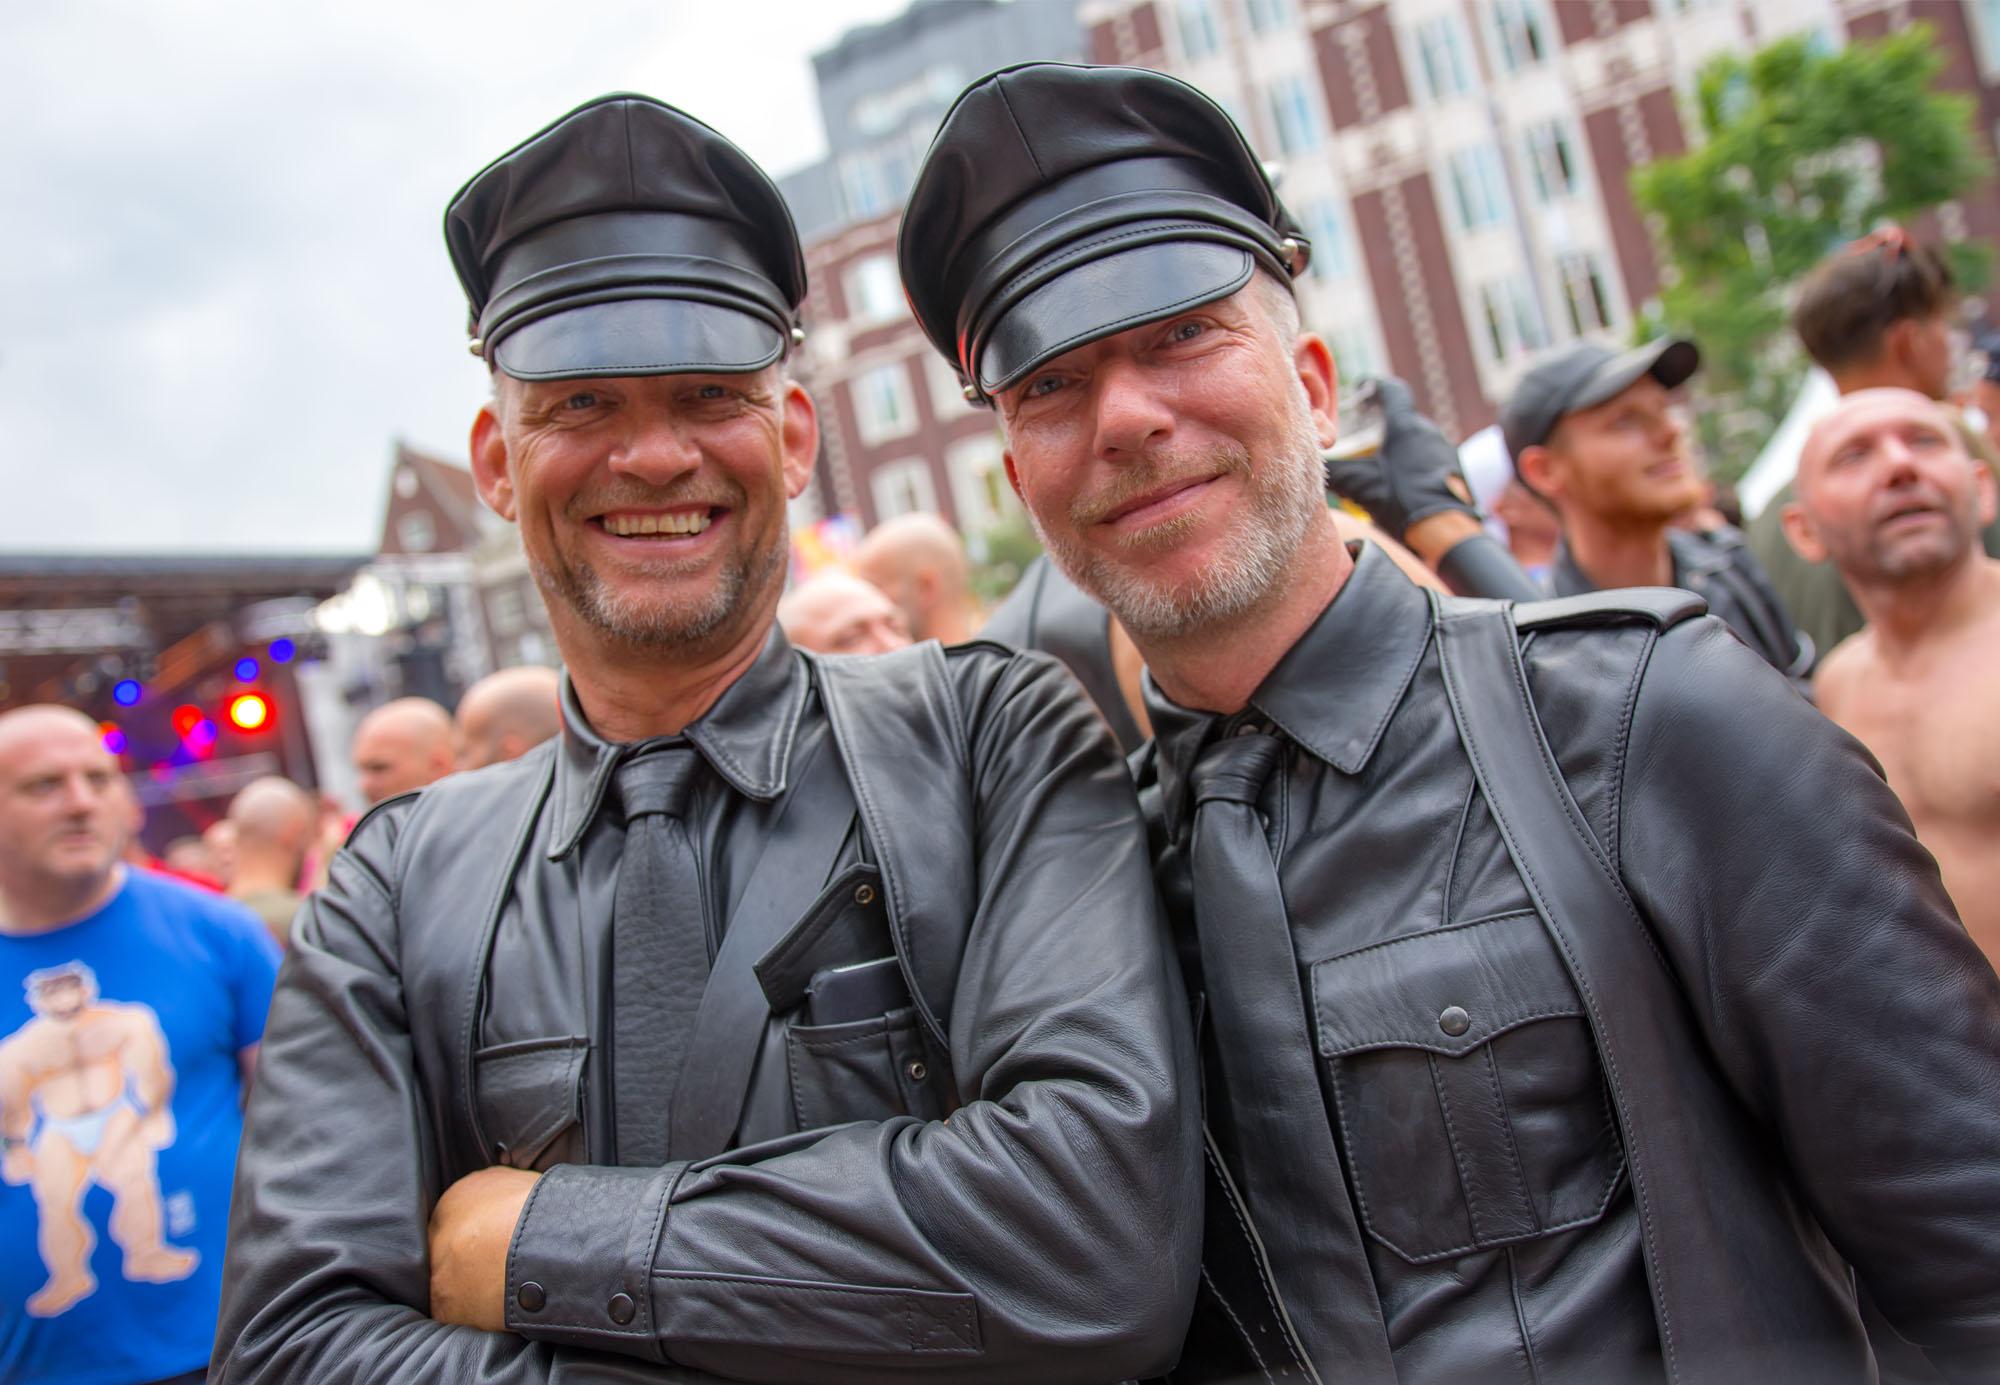 Amsterdam-Pride-03-08-2019-_0031_Hinterg